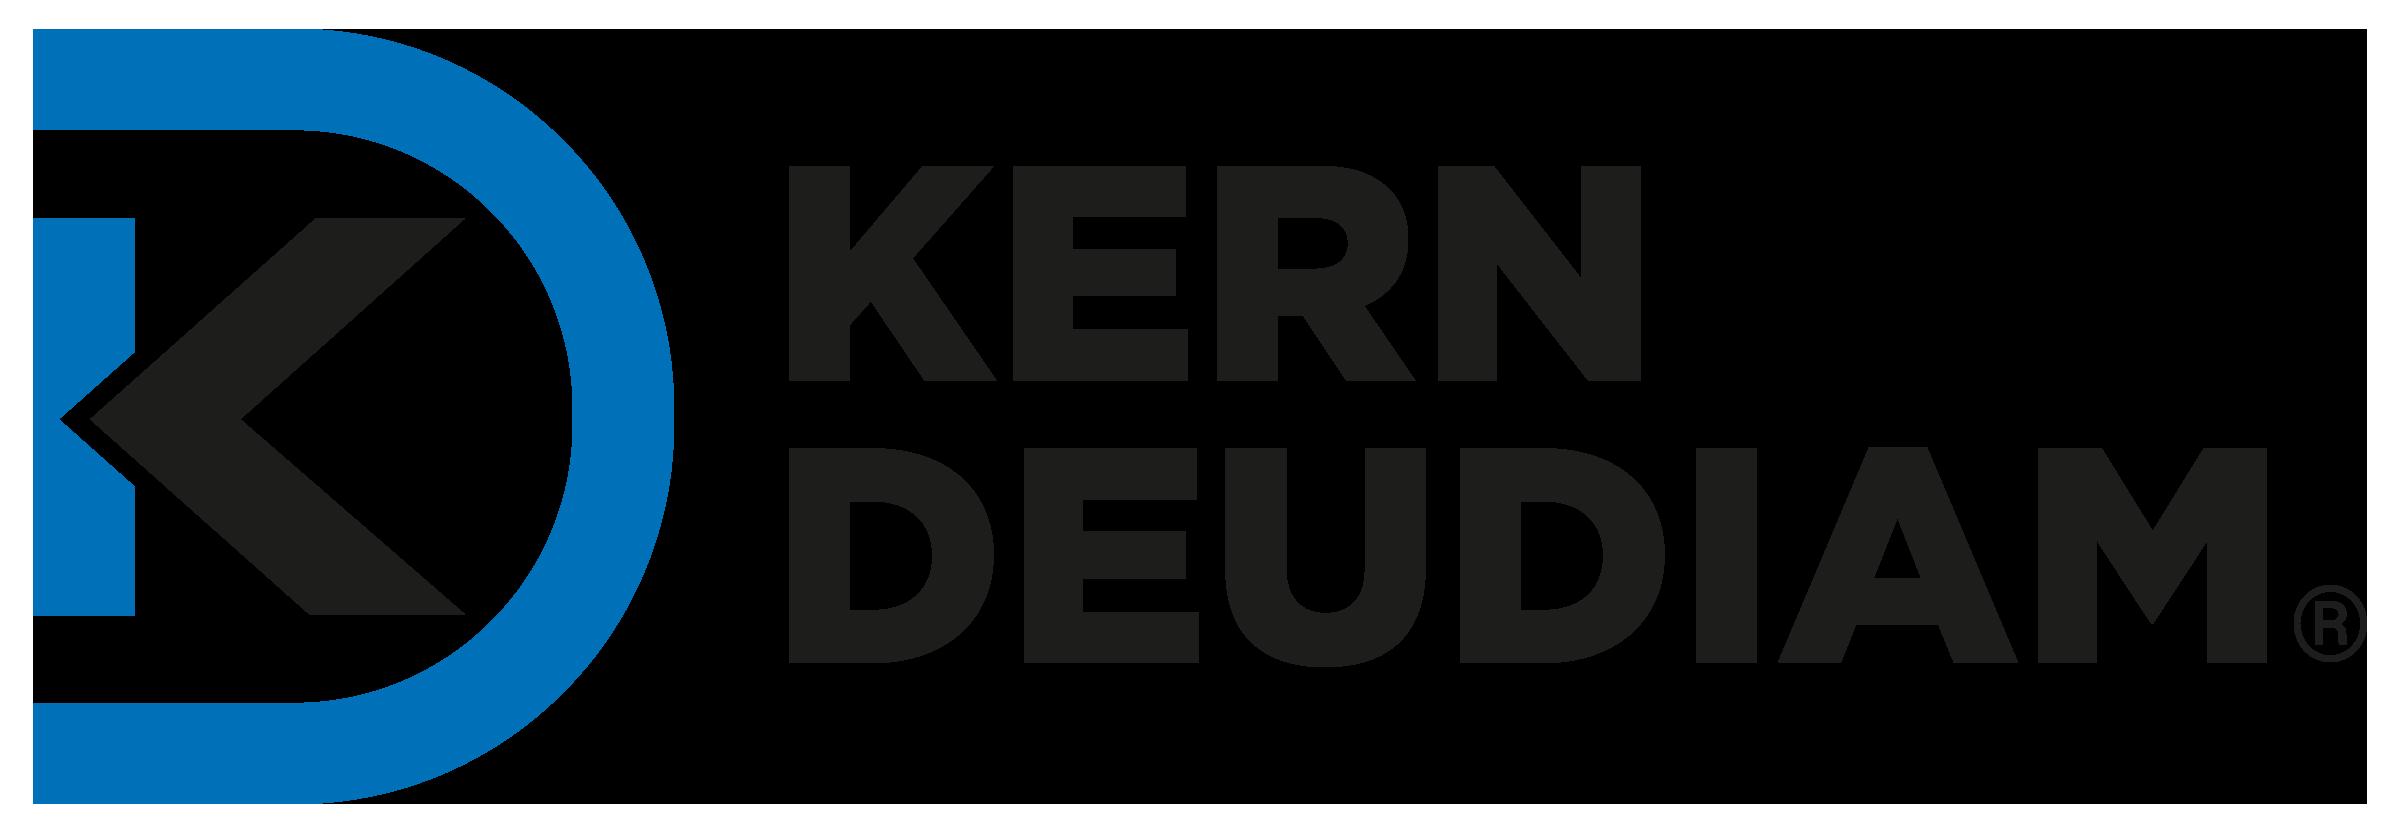 KERN-DEUDIAM Middle East Logo Dubai